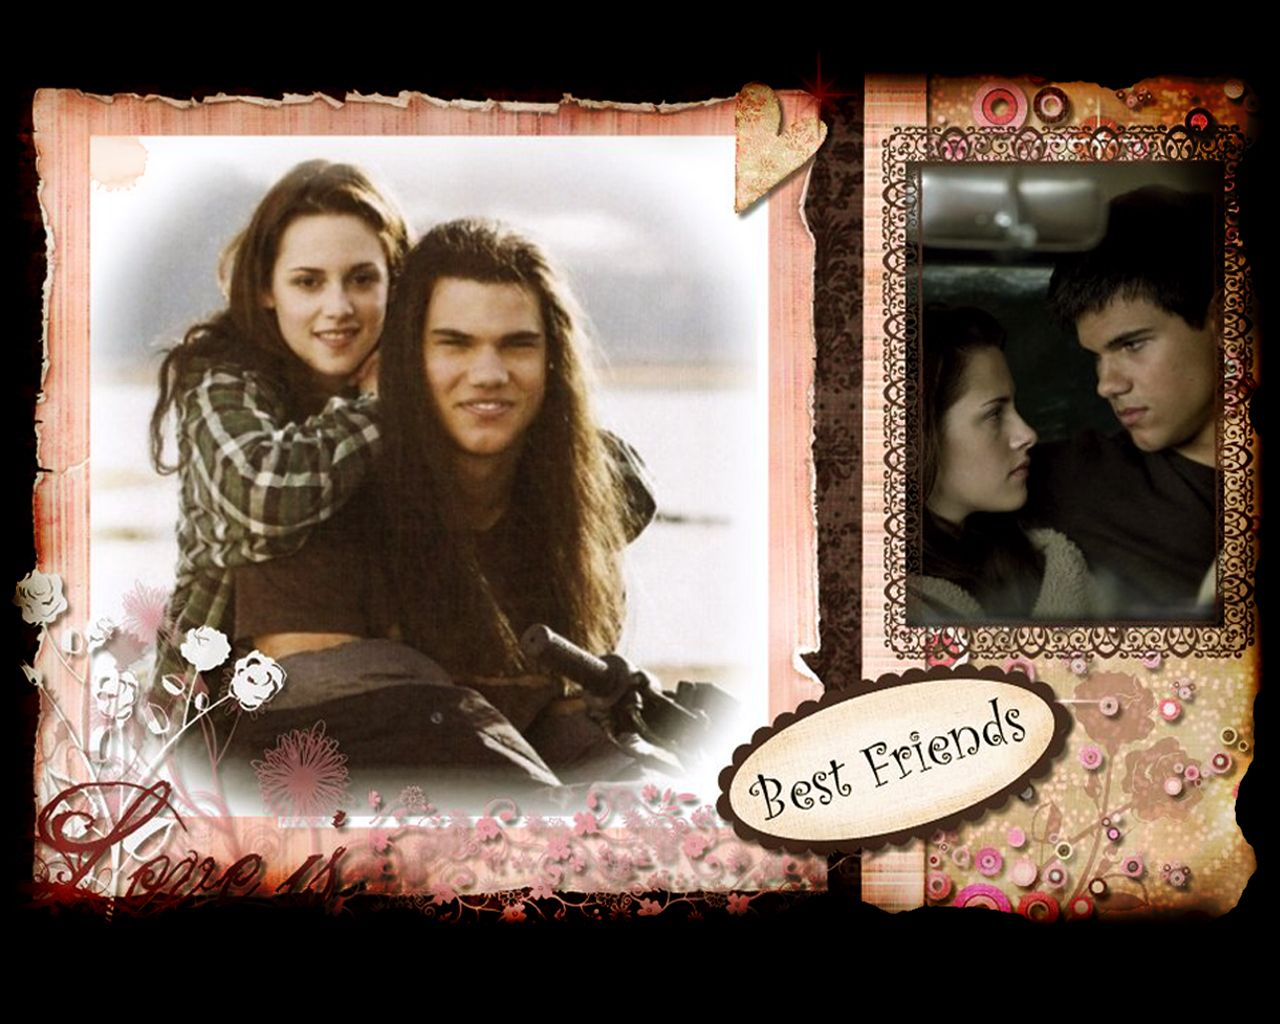 Best friend scrapbook ideas - Jacob And Bella Best Friends Scrapbook Page 1280x1024 Photo